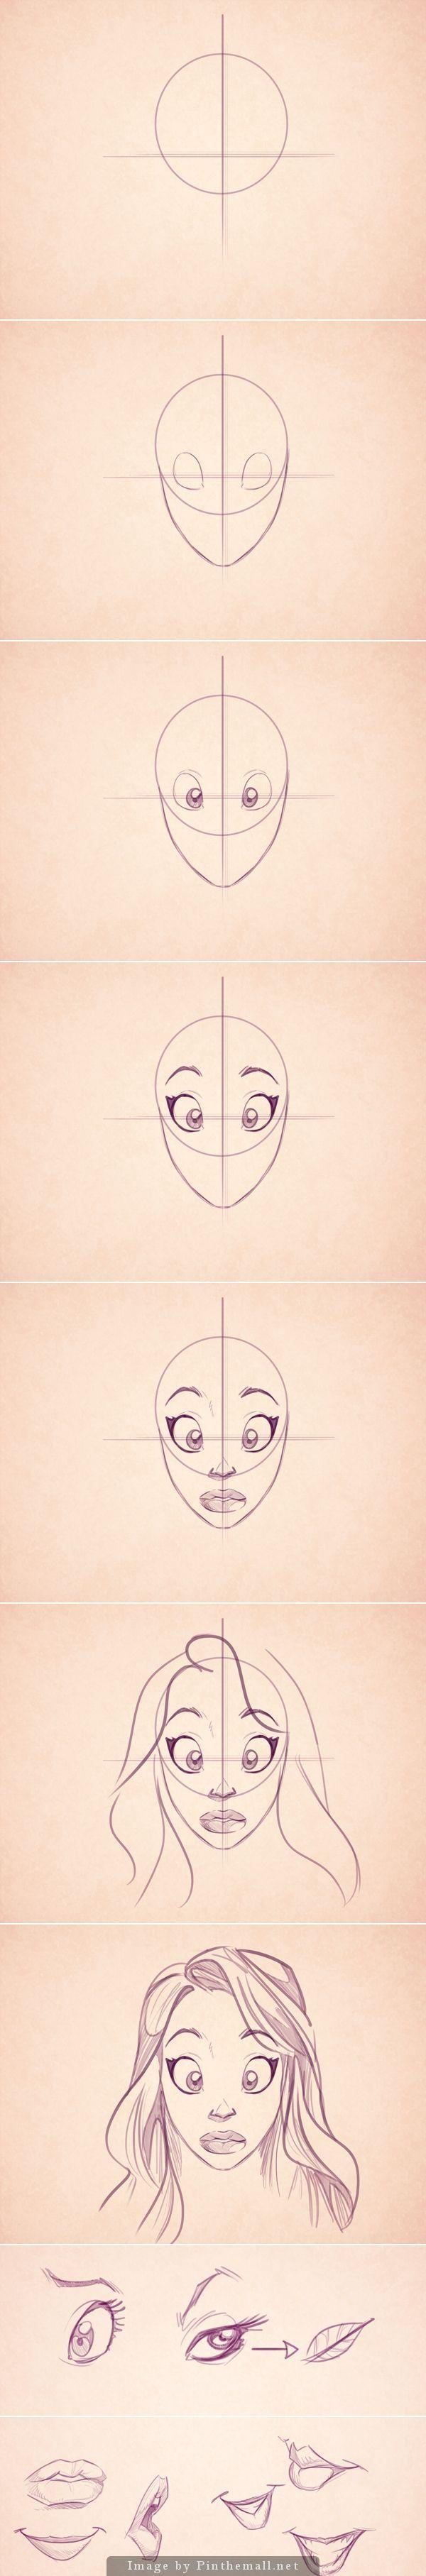 Cartoon Fundamentals: How to Draw the Female Form: